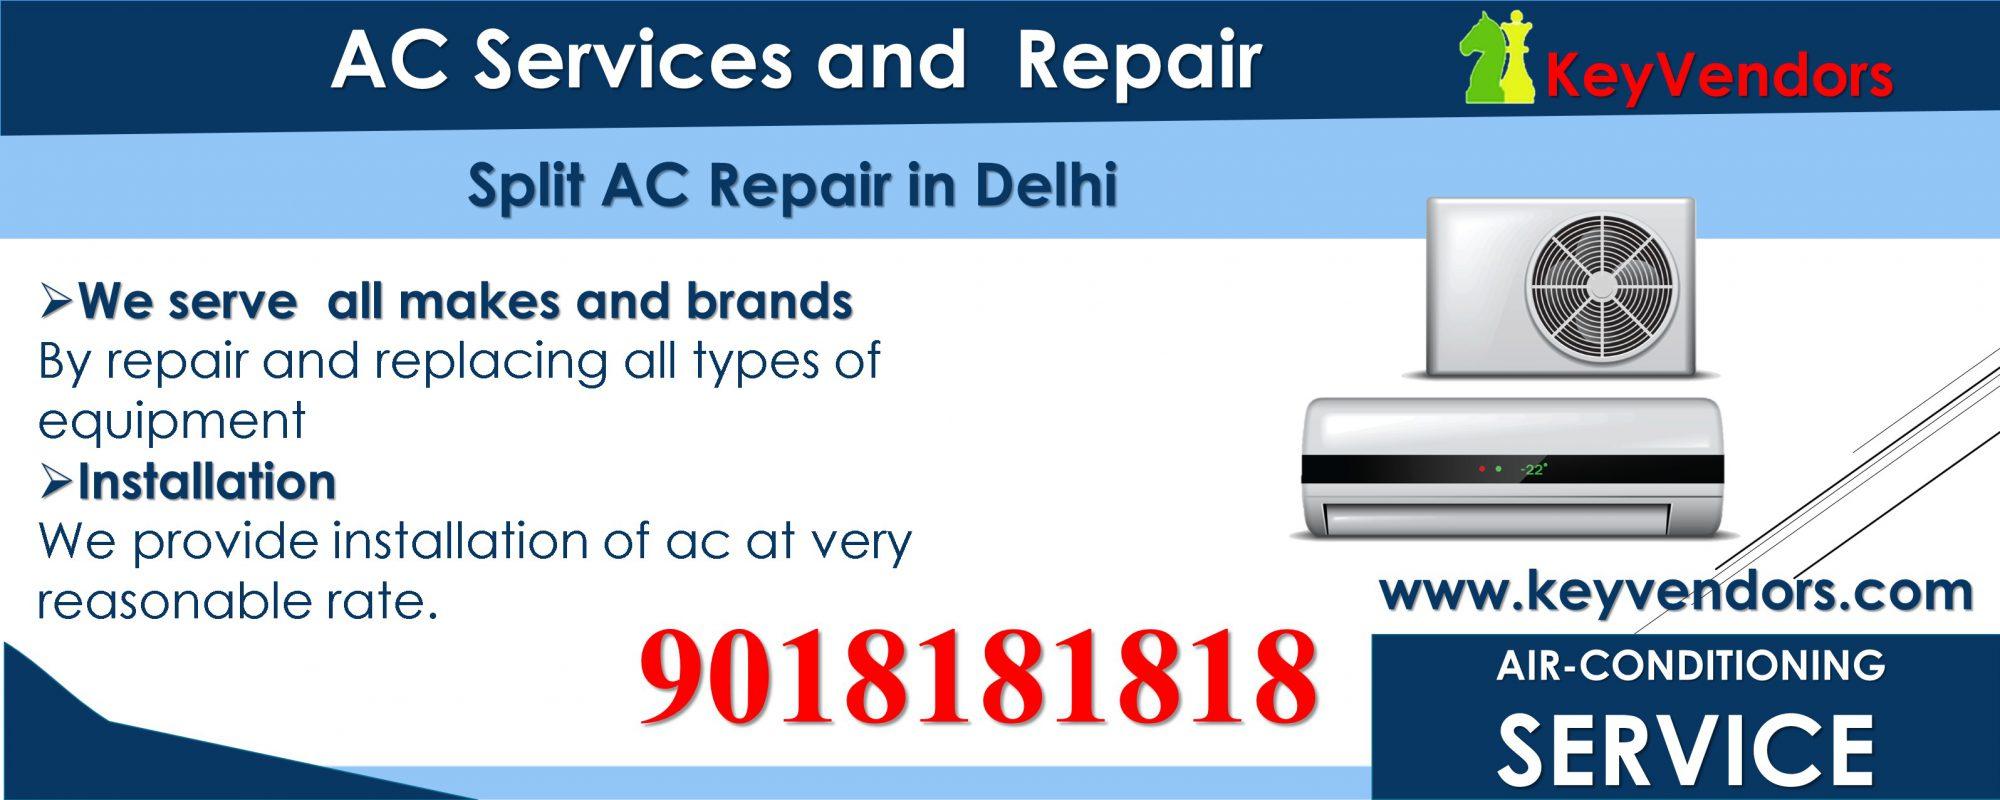 Best AC Repair Services in Delhi NCR